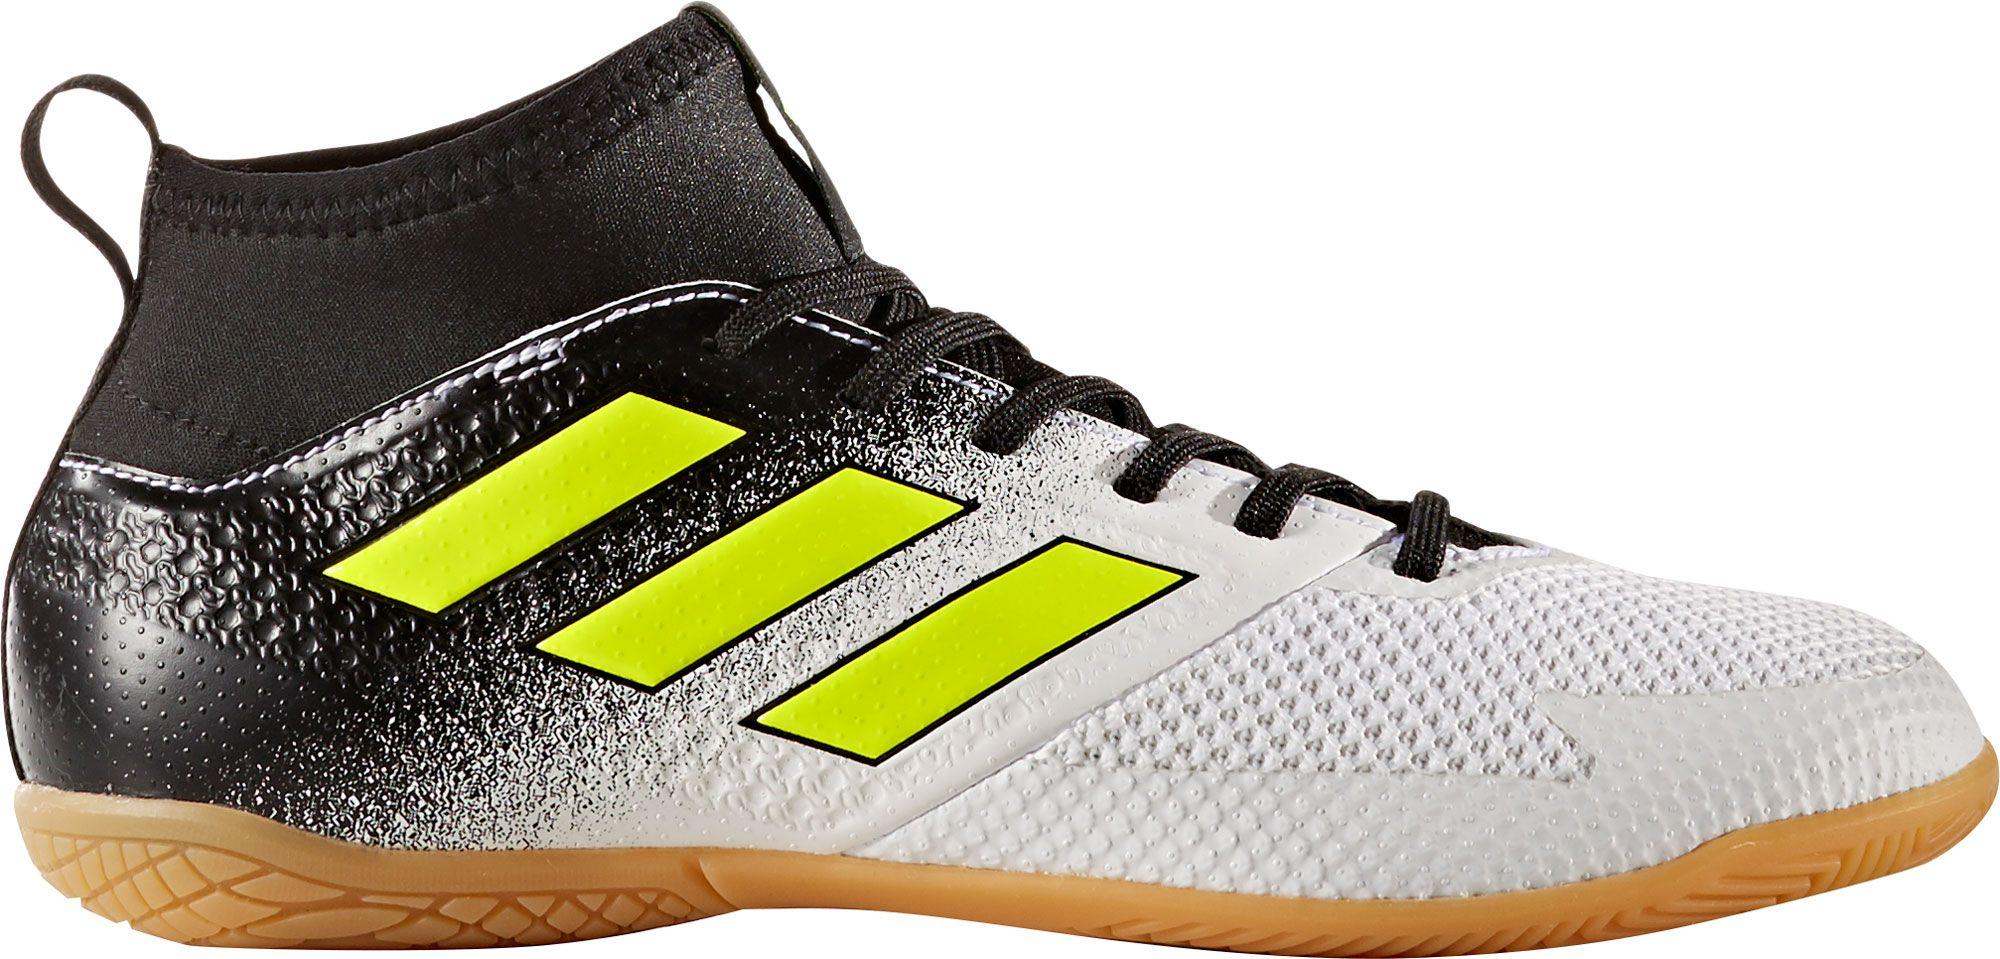 Adidas Indoor Soccer Shoes Toddler Girls